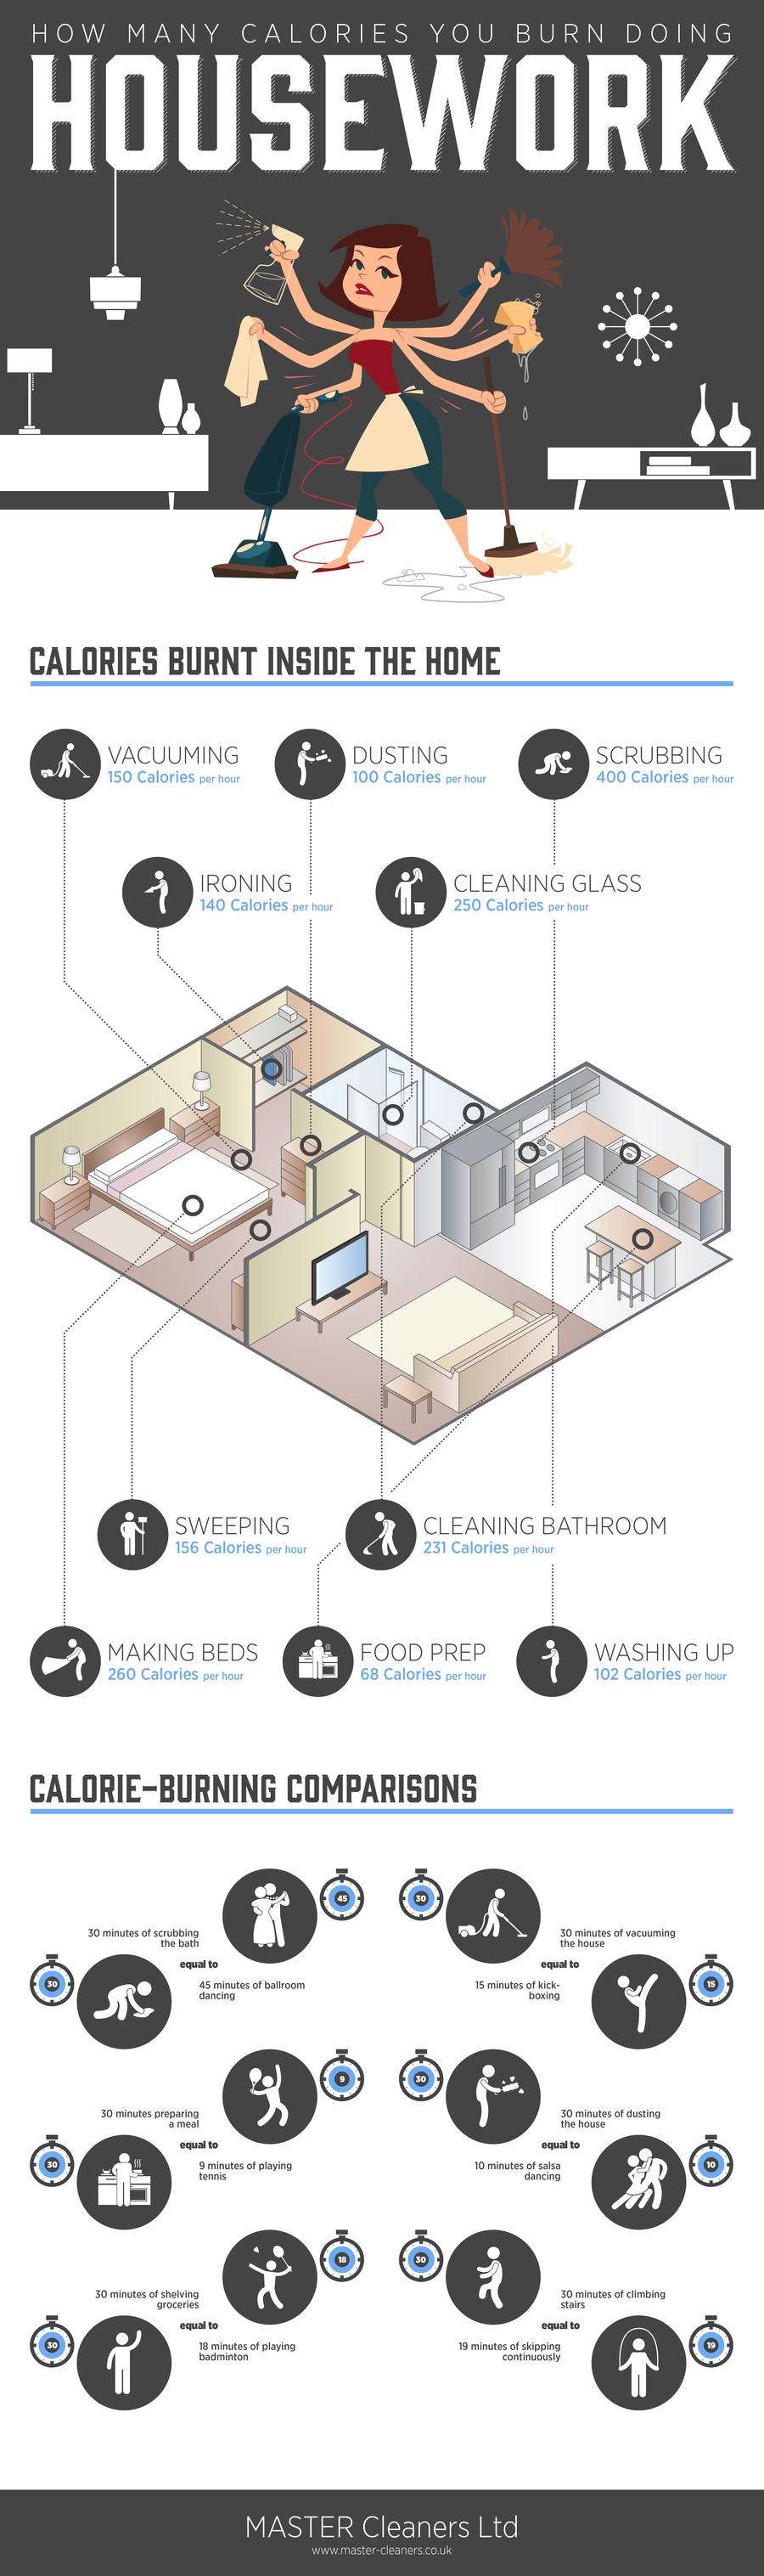 Housework Calories Burnt-Infographic